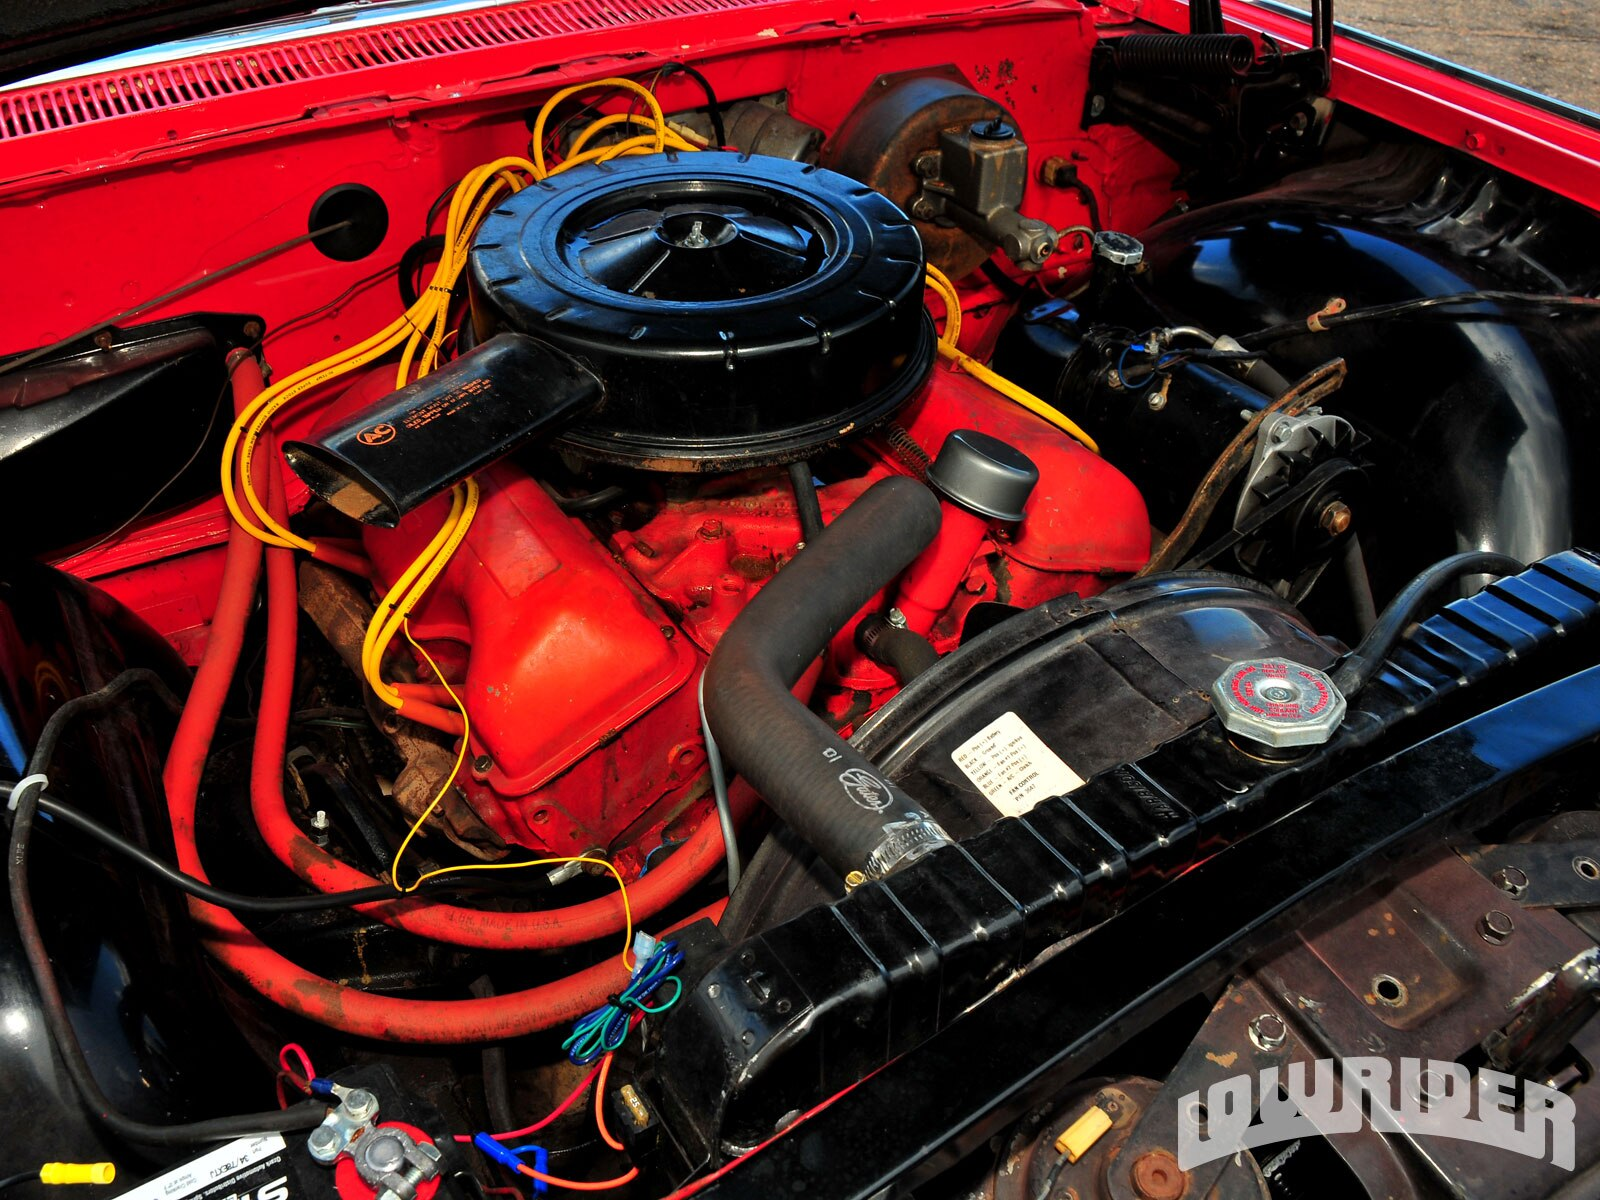 1961 Chevrolet Impala Convertible Amp 1959 Chevrolet Impala